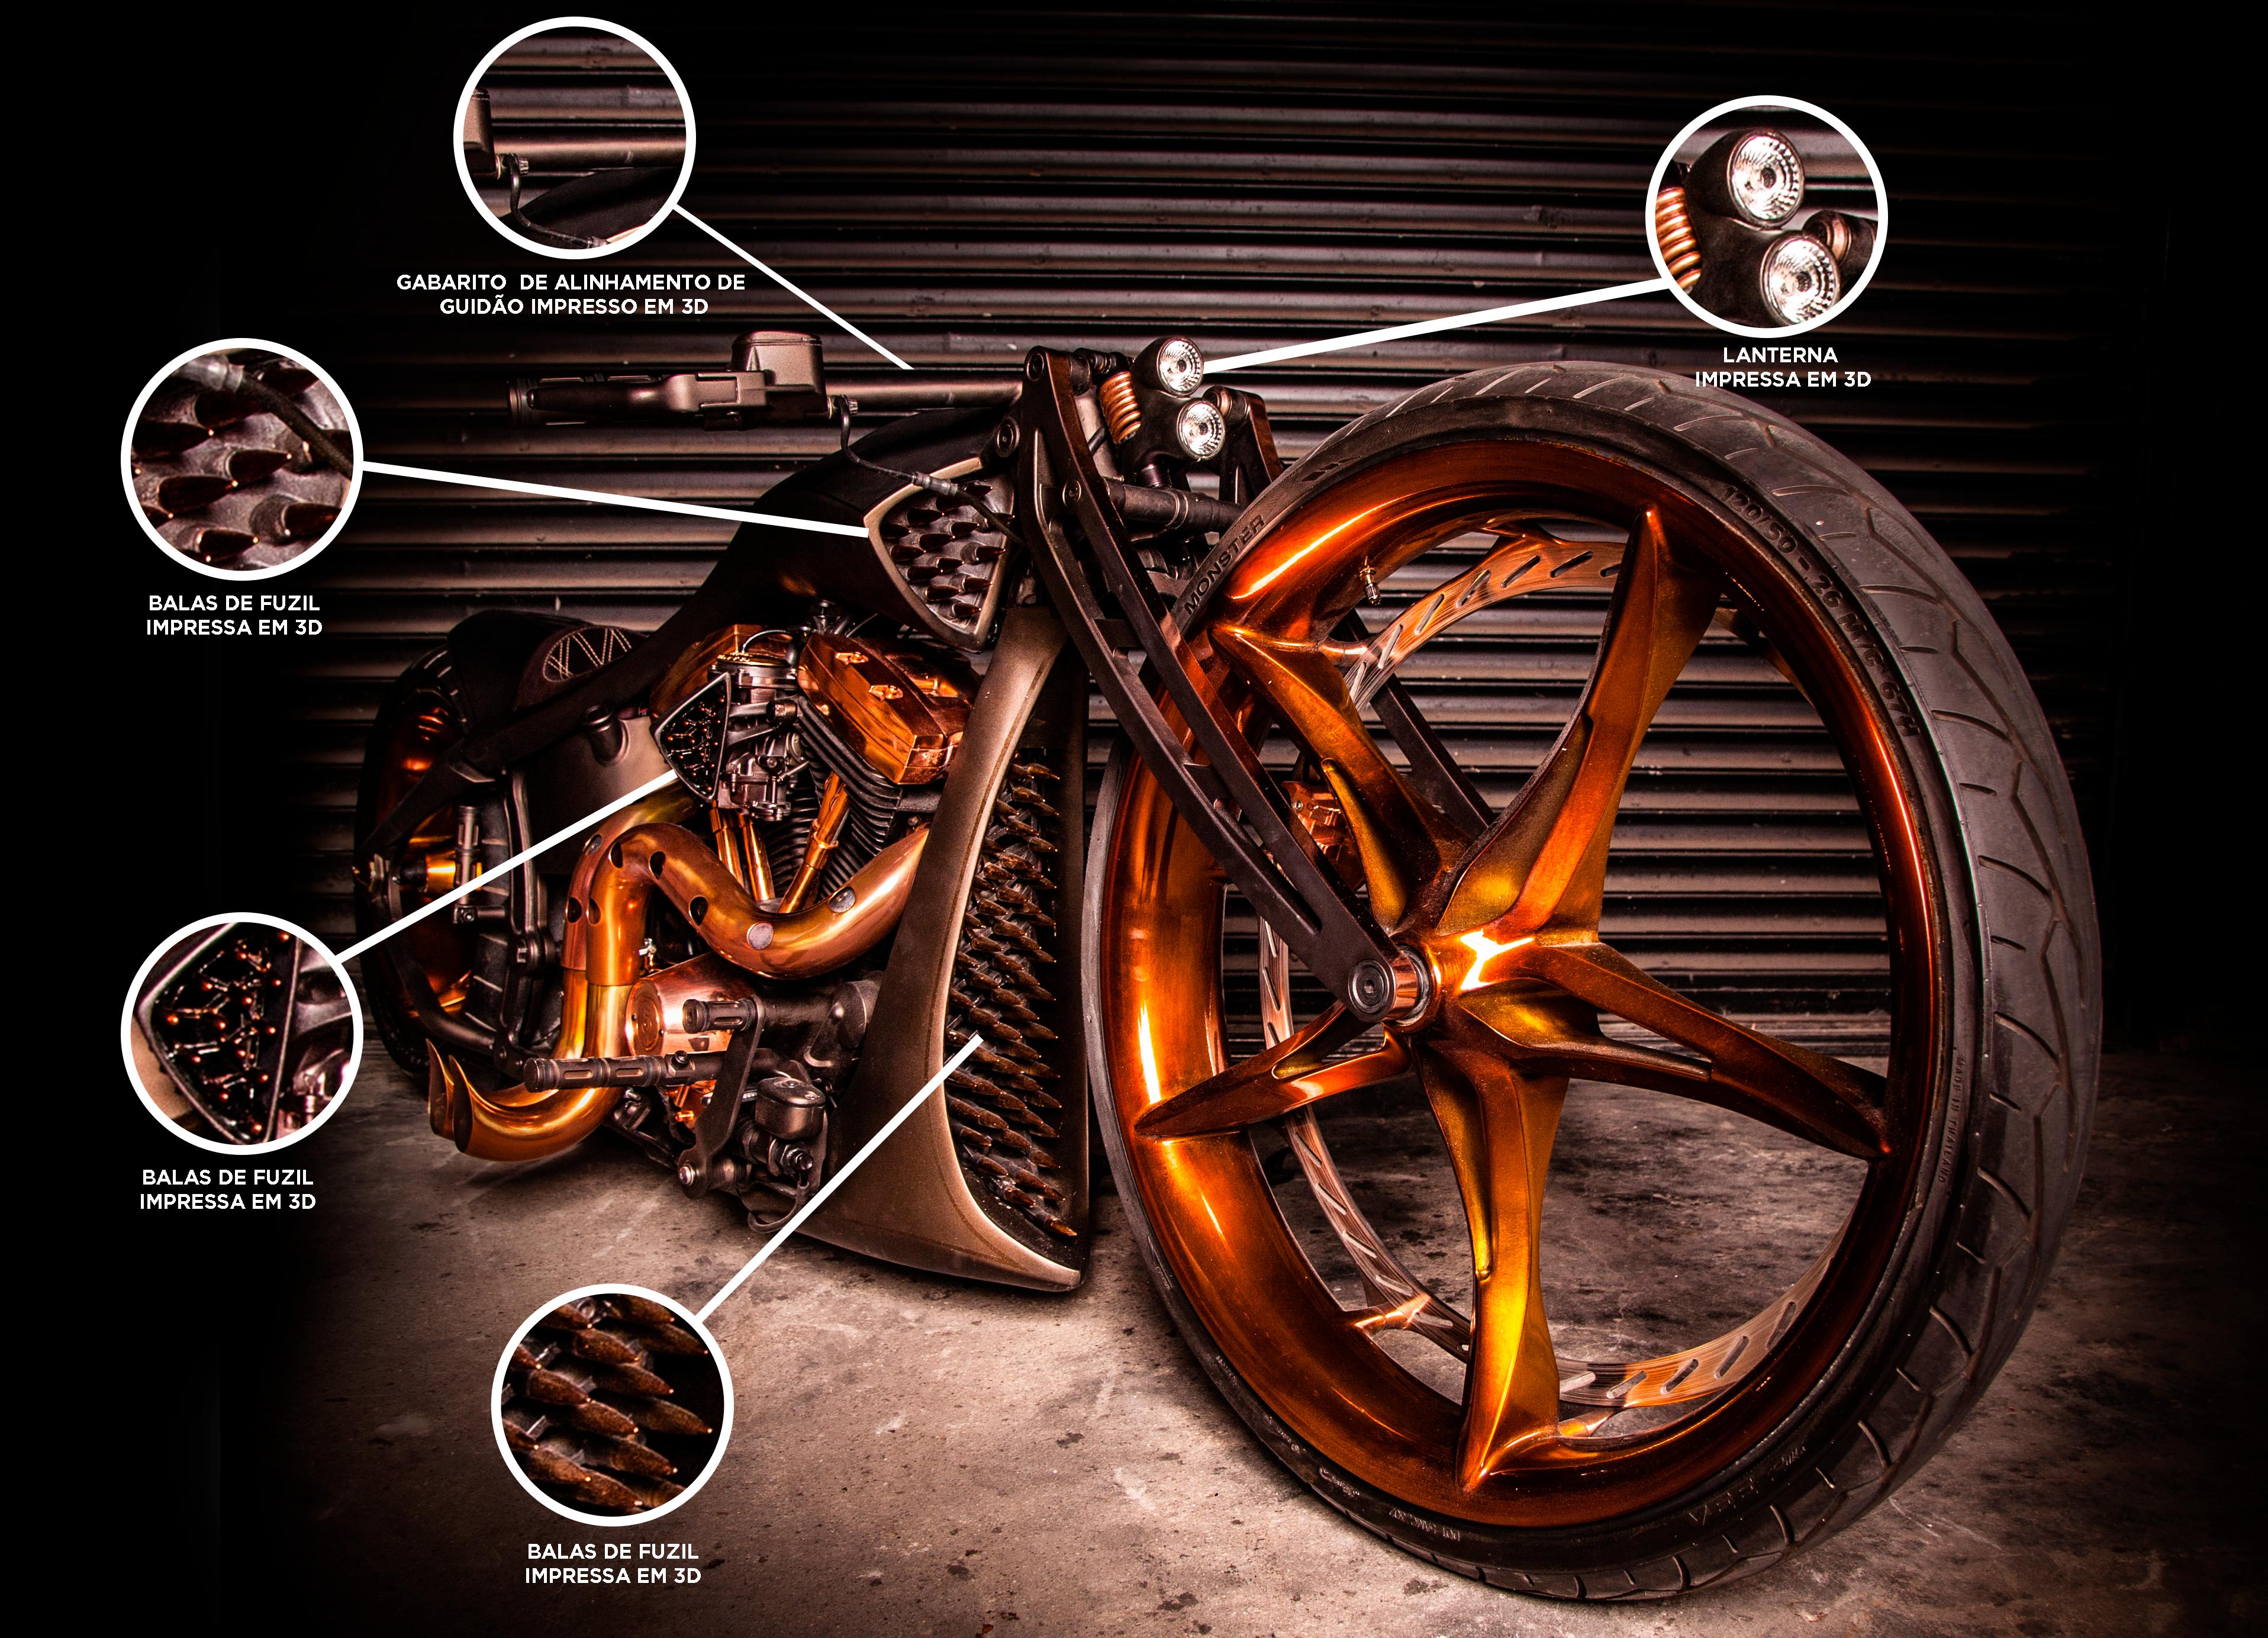 impressao 3d na oficina tmc tarso marques concept personalizacao moto tmc armata